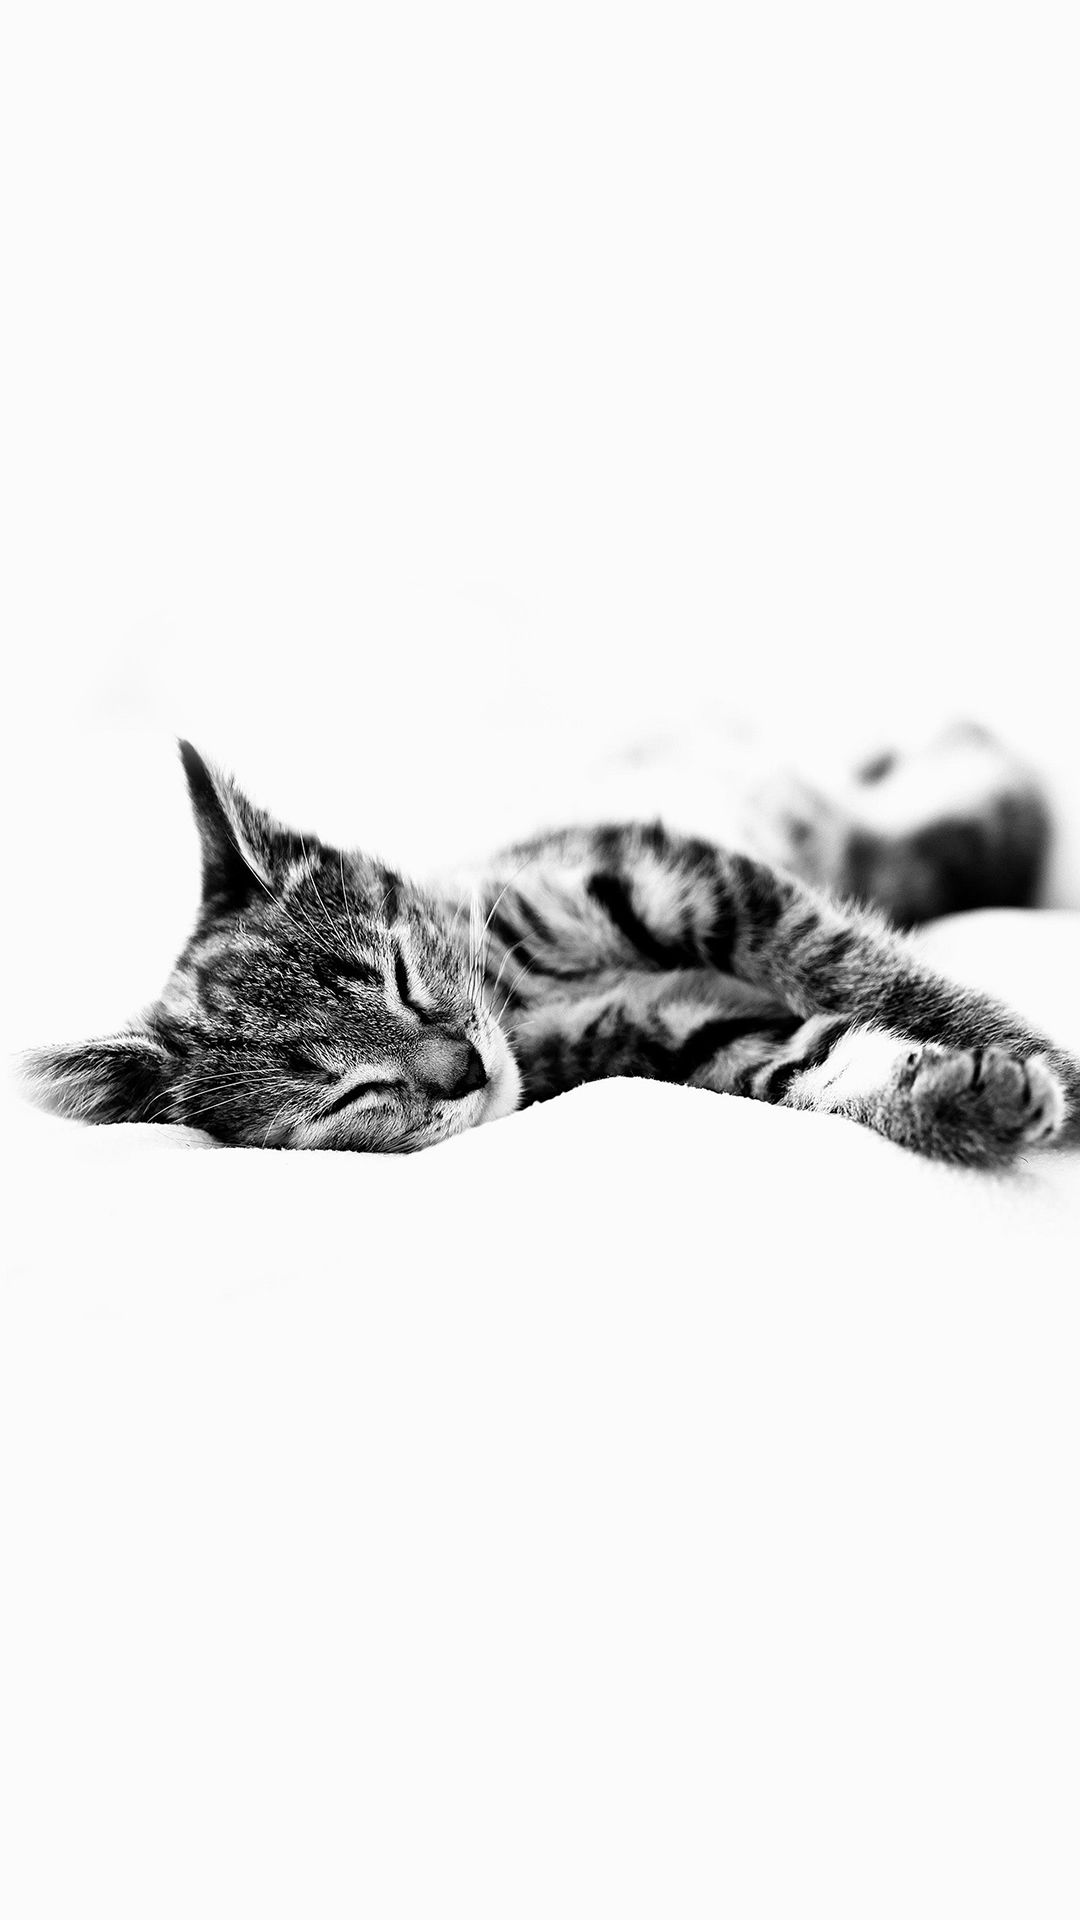 Sleepy Cat Kitten White Animal Iphone 6 Wallpaper Download Iphone Wallpapers Ipad Wallpapers One Stop Download Kitten Wallpaper Cat Background Cat Wallpaper